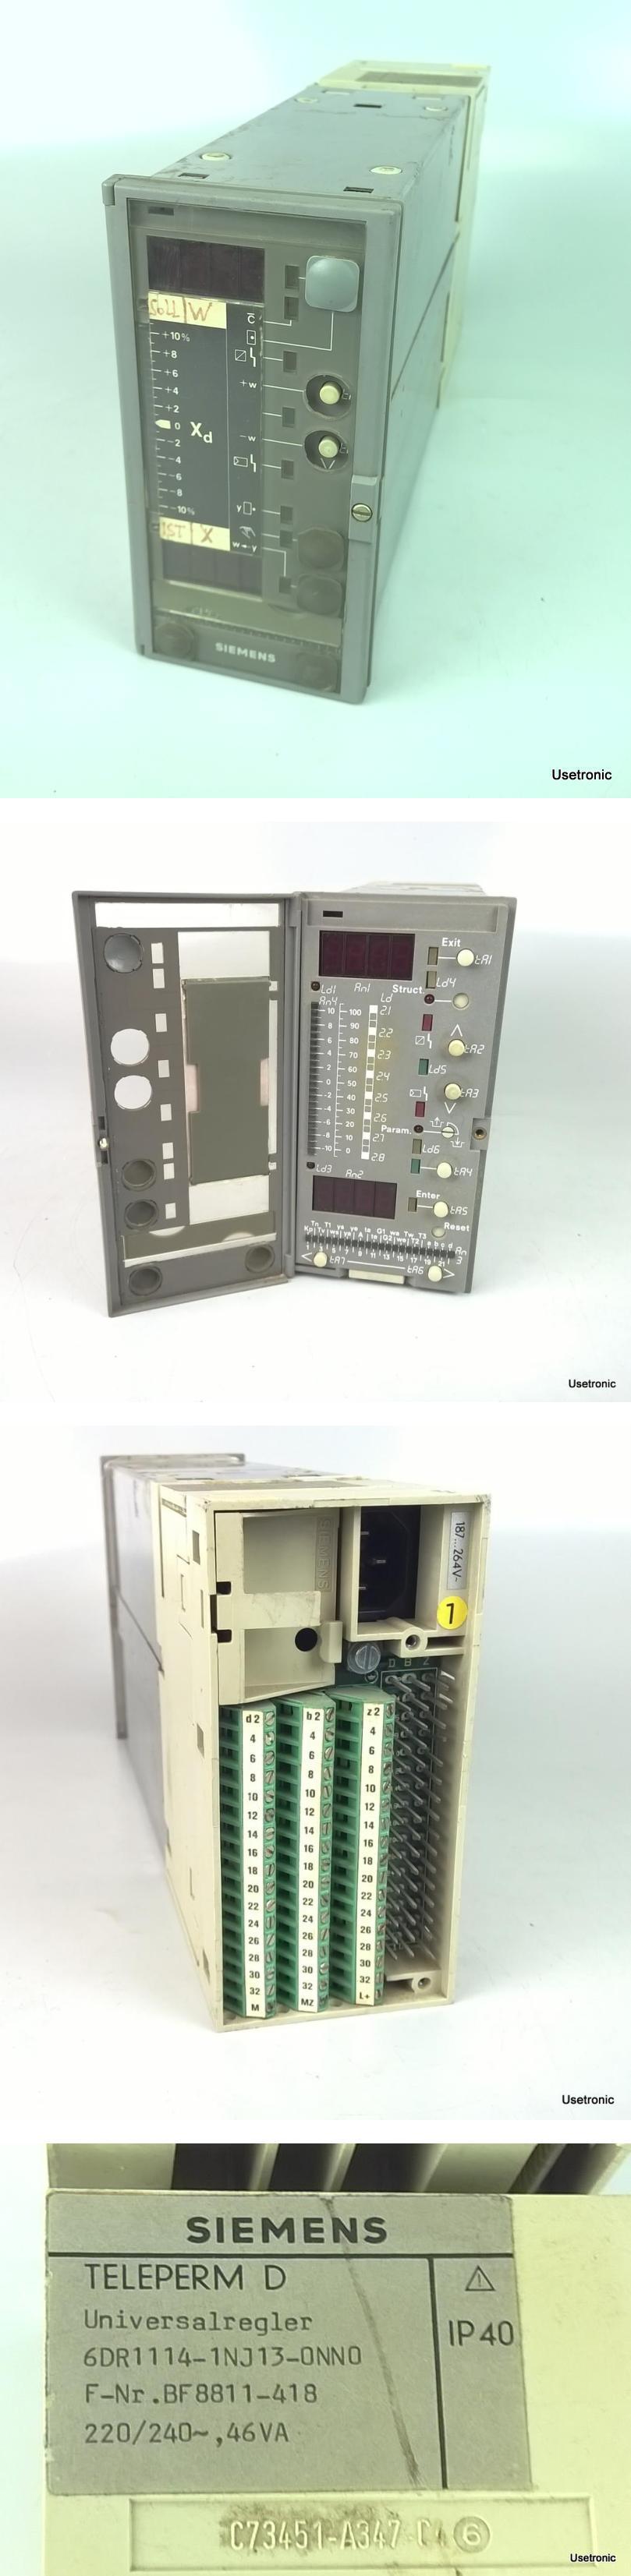 Siemens 6DR1114-1NJ13-0NN0